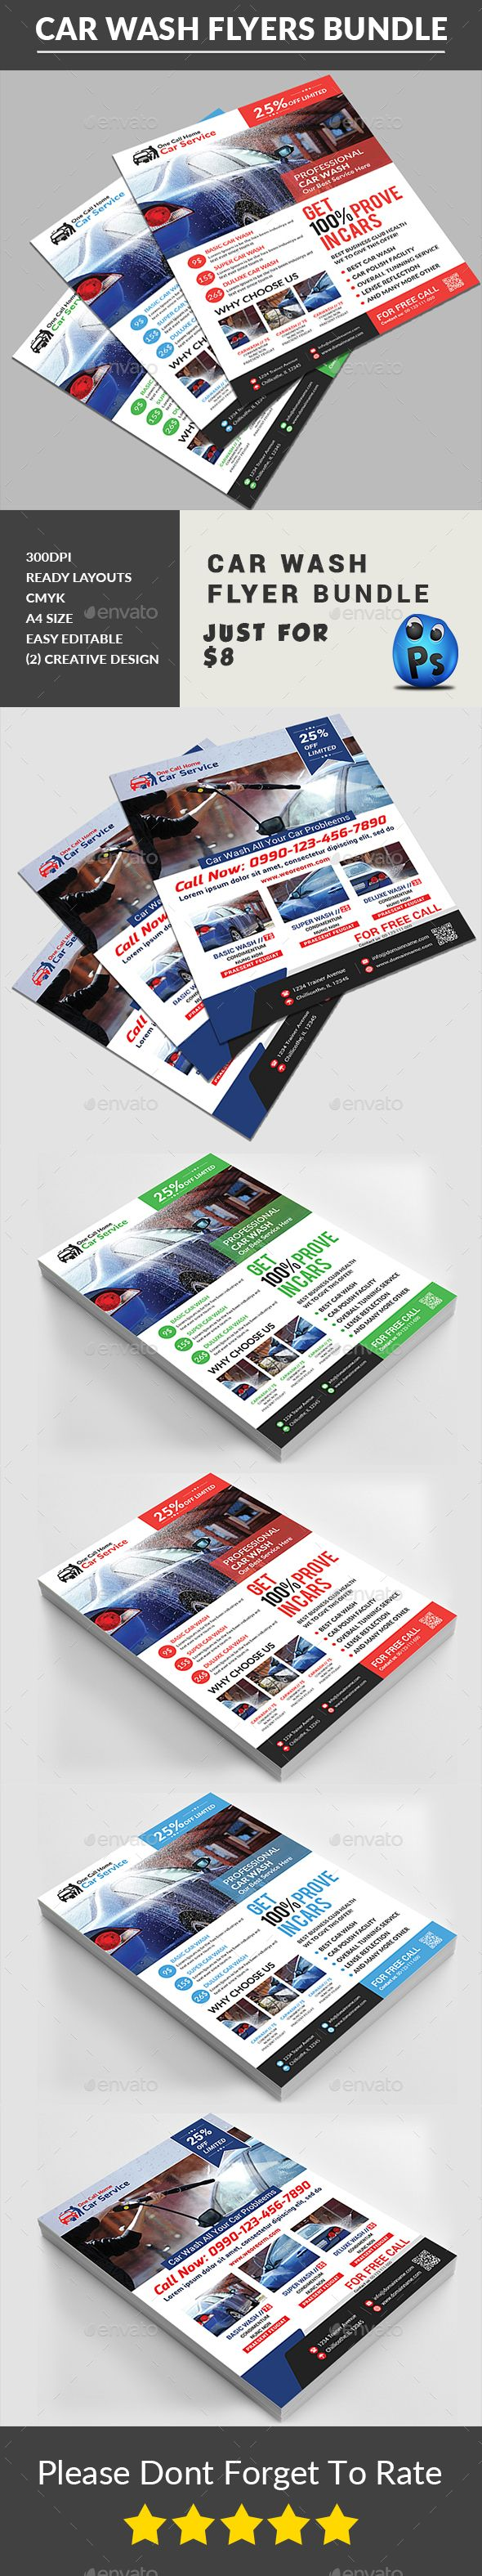 car wash flyers bundle flyer design templates cars and flyers car wash flyers design template bundle corporate flyers design template psd here